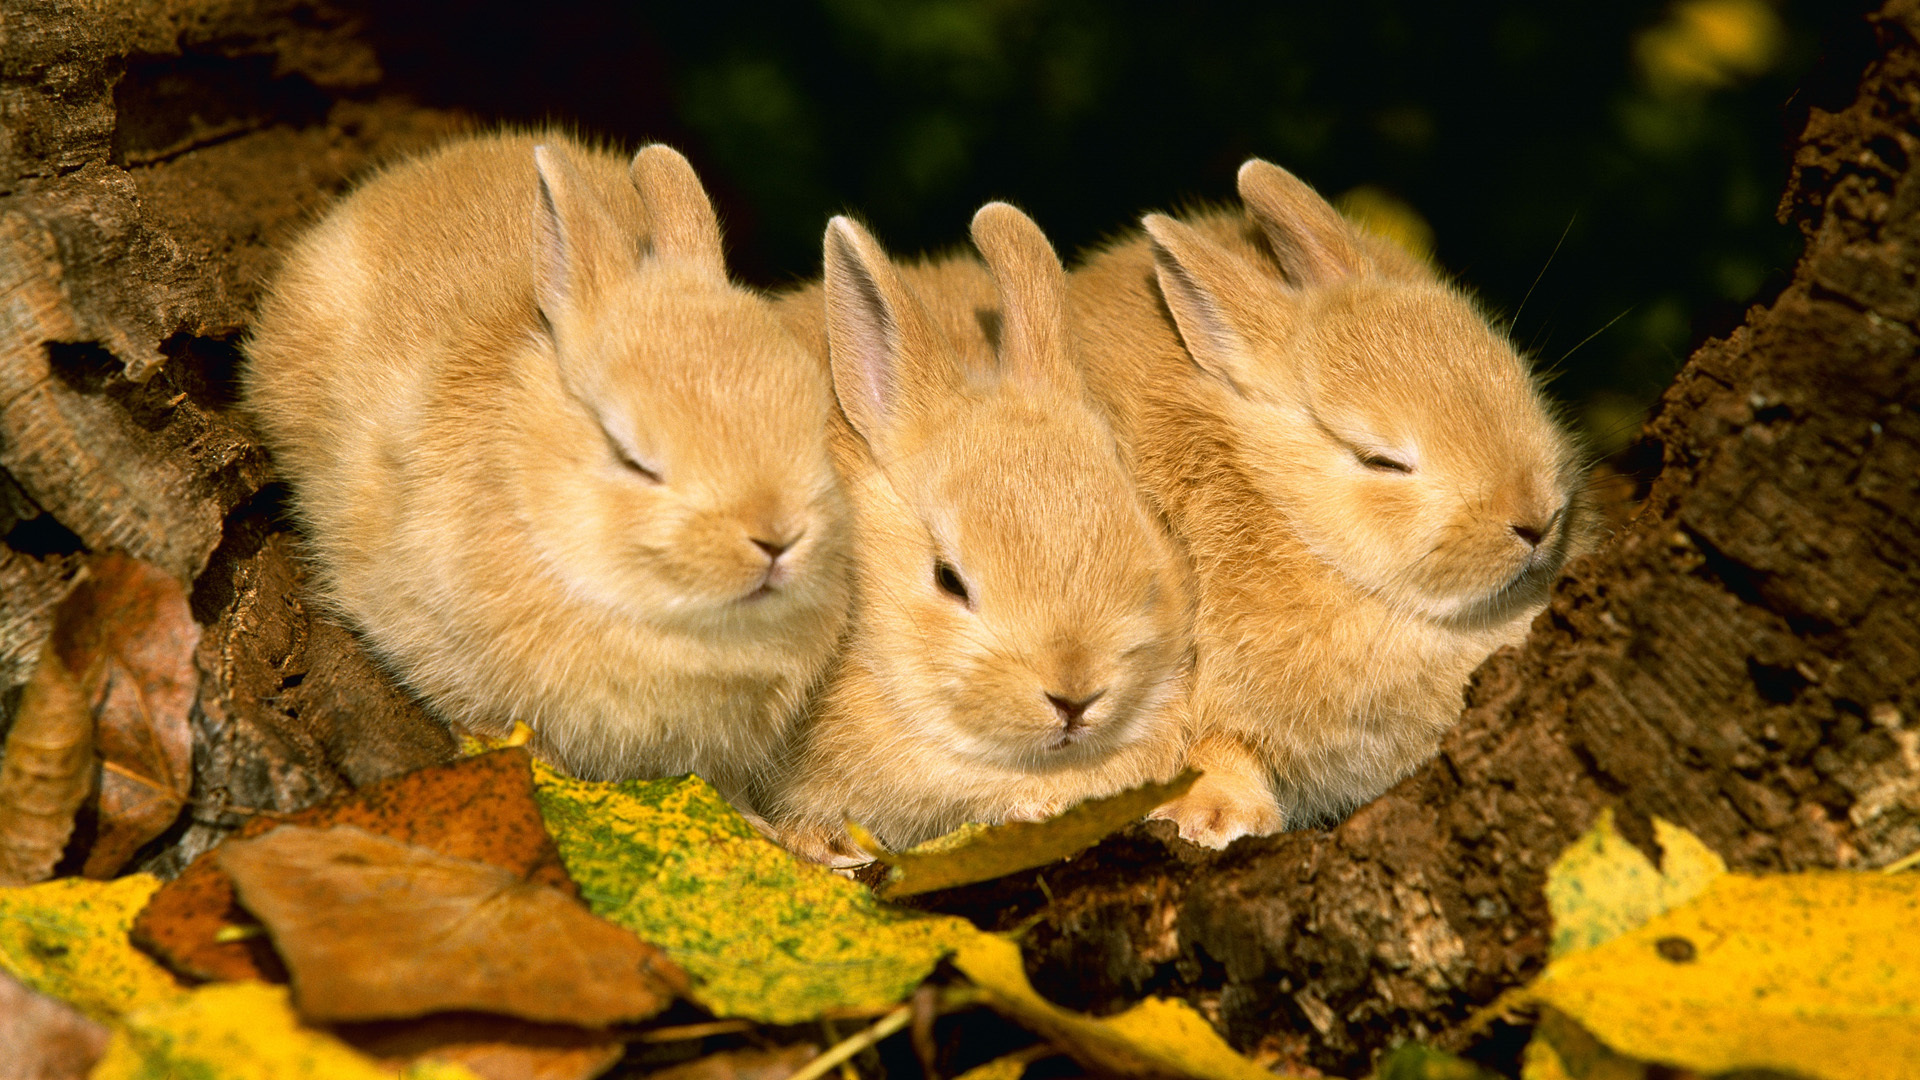 кролик девушка природа животное  № 1594079 бесплатно